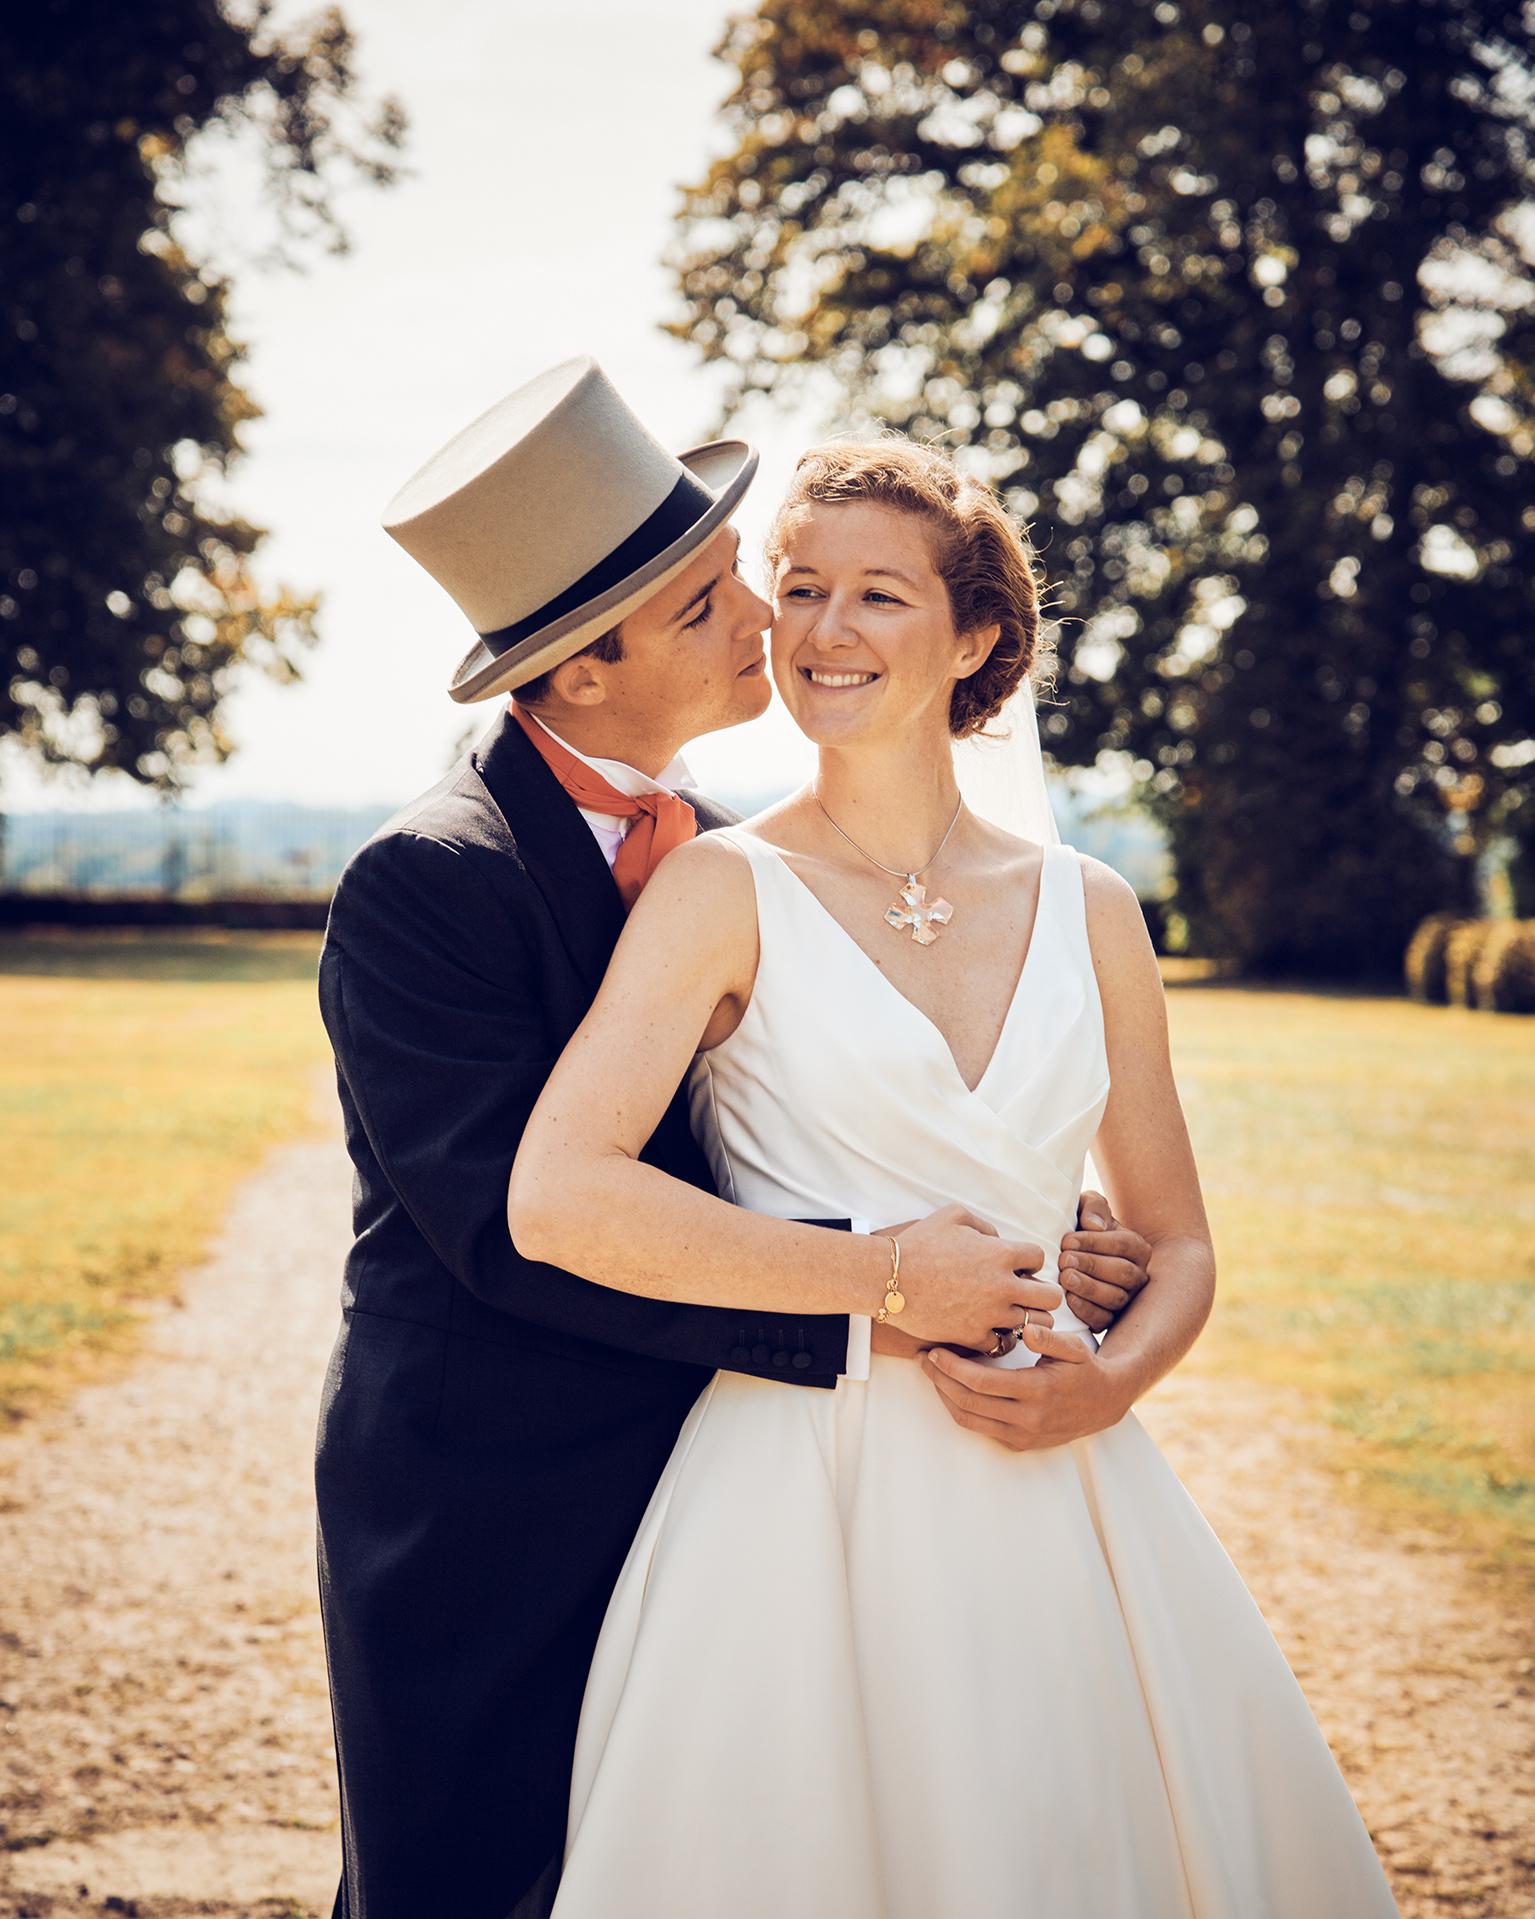 gael-creignou-photographe-mariage-22